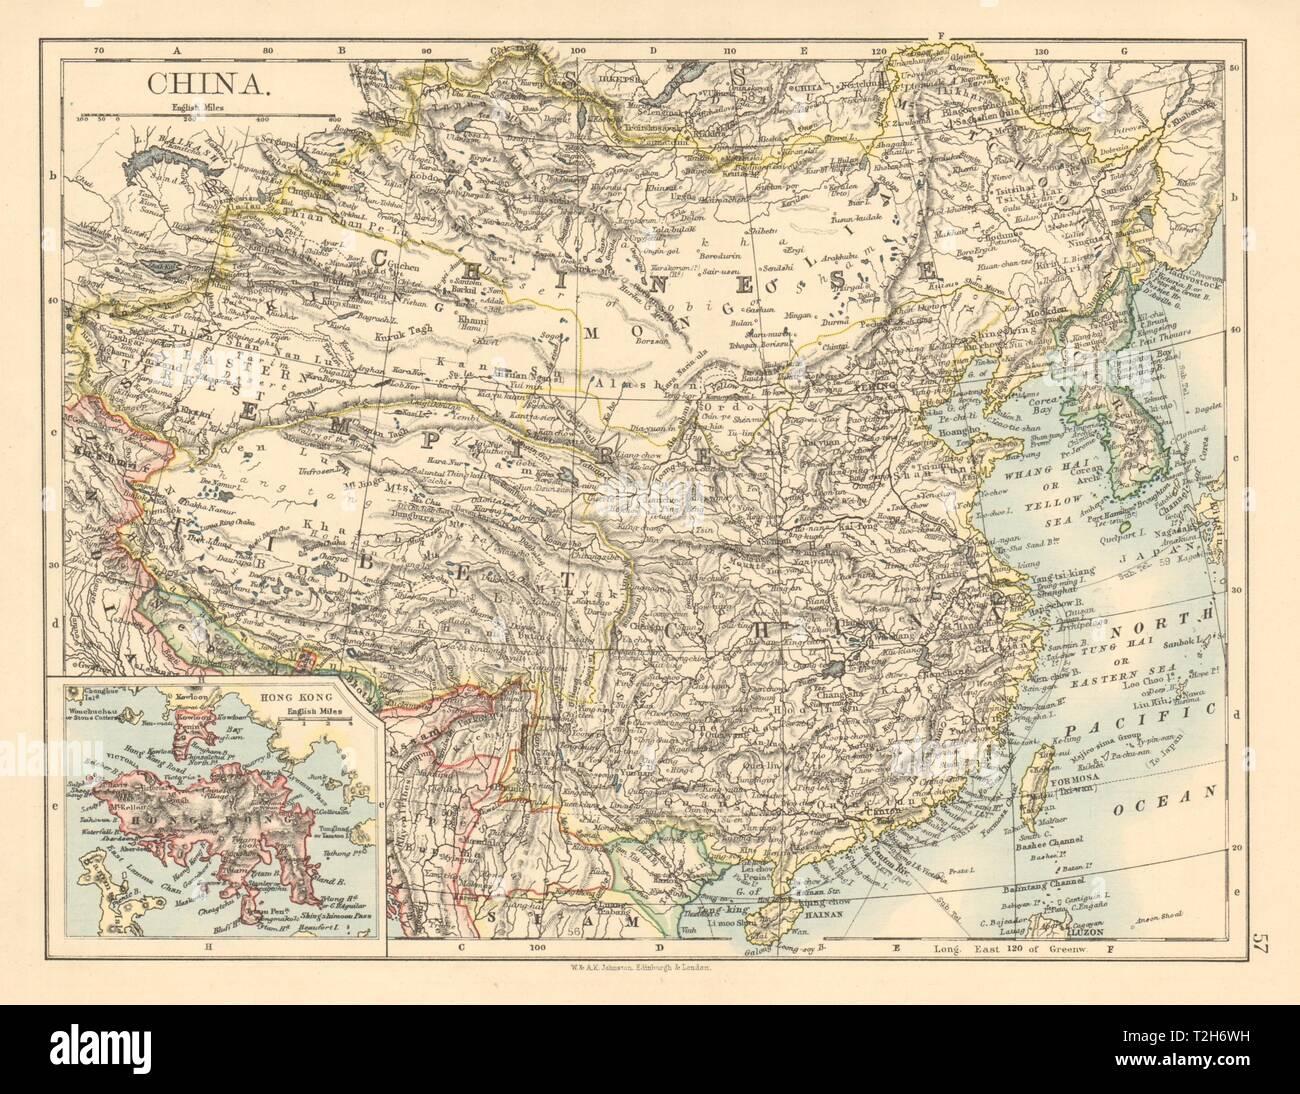 Map Of Asia Hong Kong.Chinese Empire China East Asia Tibet Mongolia Hong Kong Inset 1892